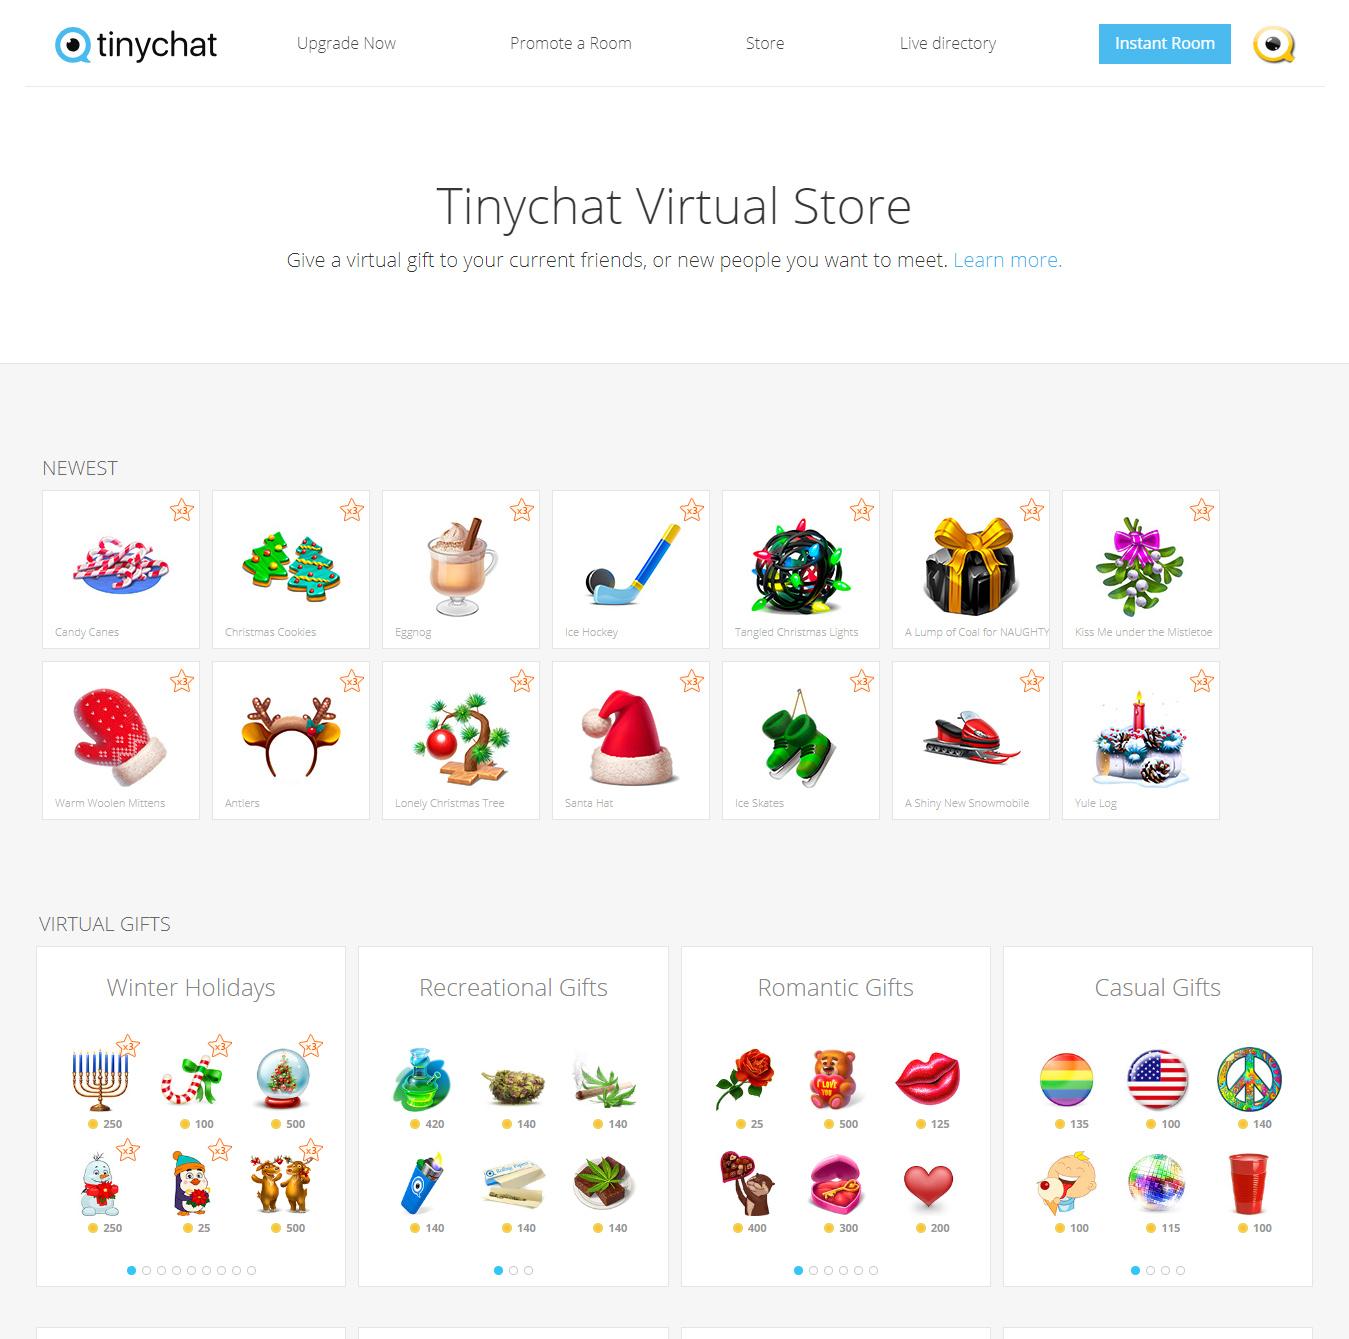 Tinychat Virtual